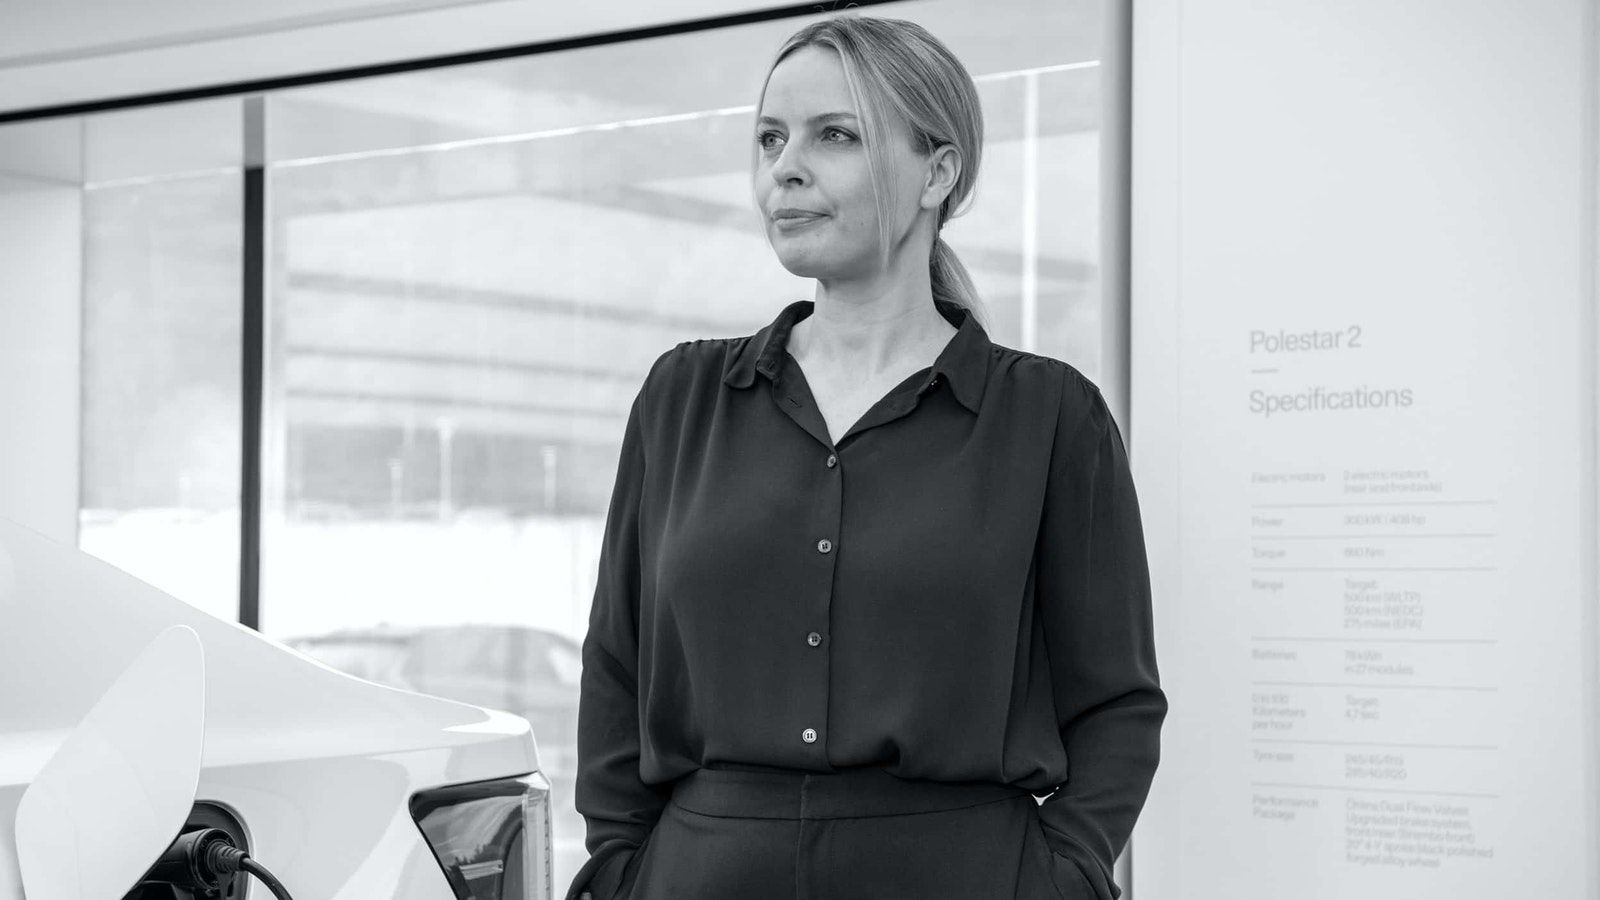 Fredrika Klarén – Head of Sustainability bij Polestar.